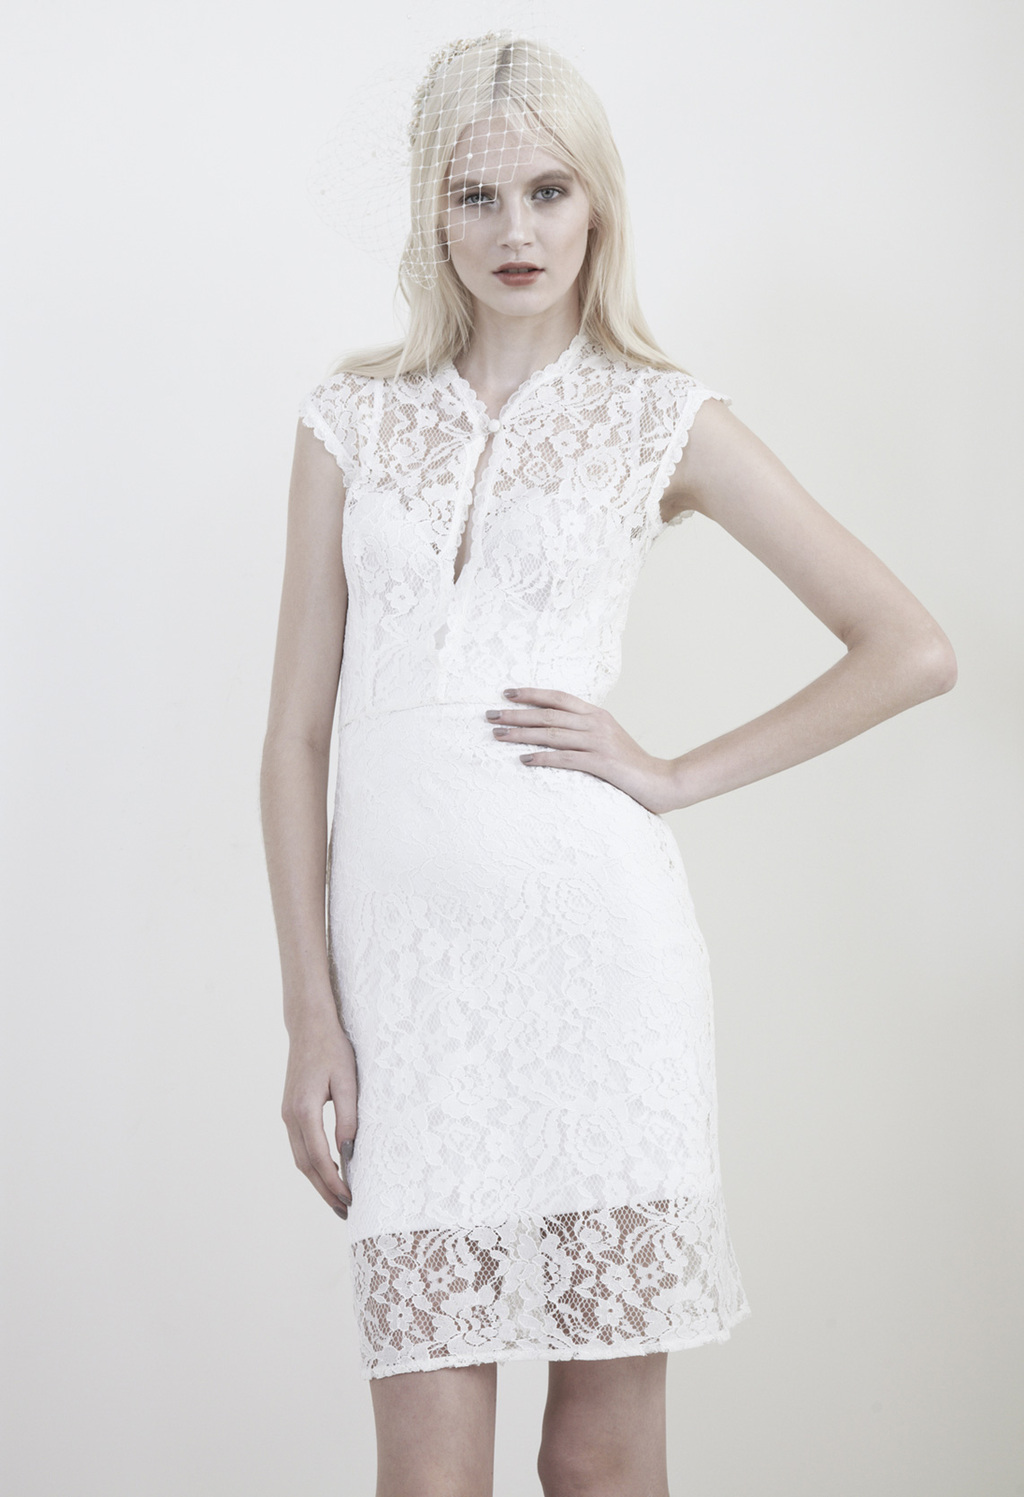 Mariana-hardwick-wedding-dress-2013-bridal-grace.full